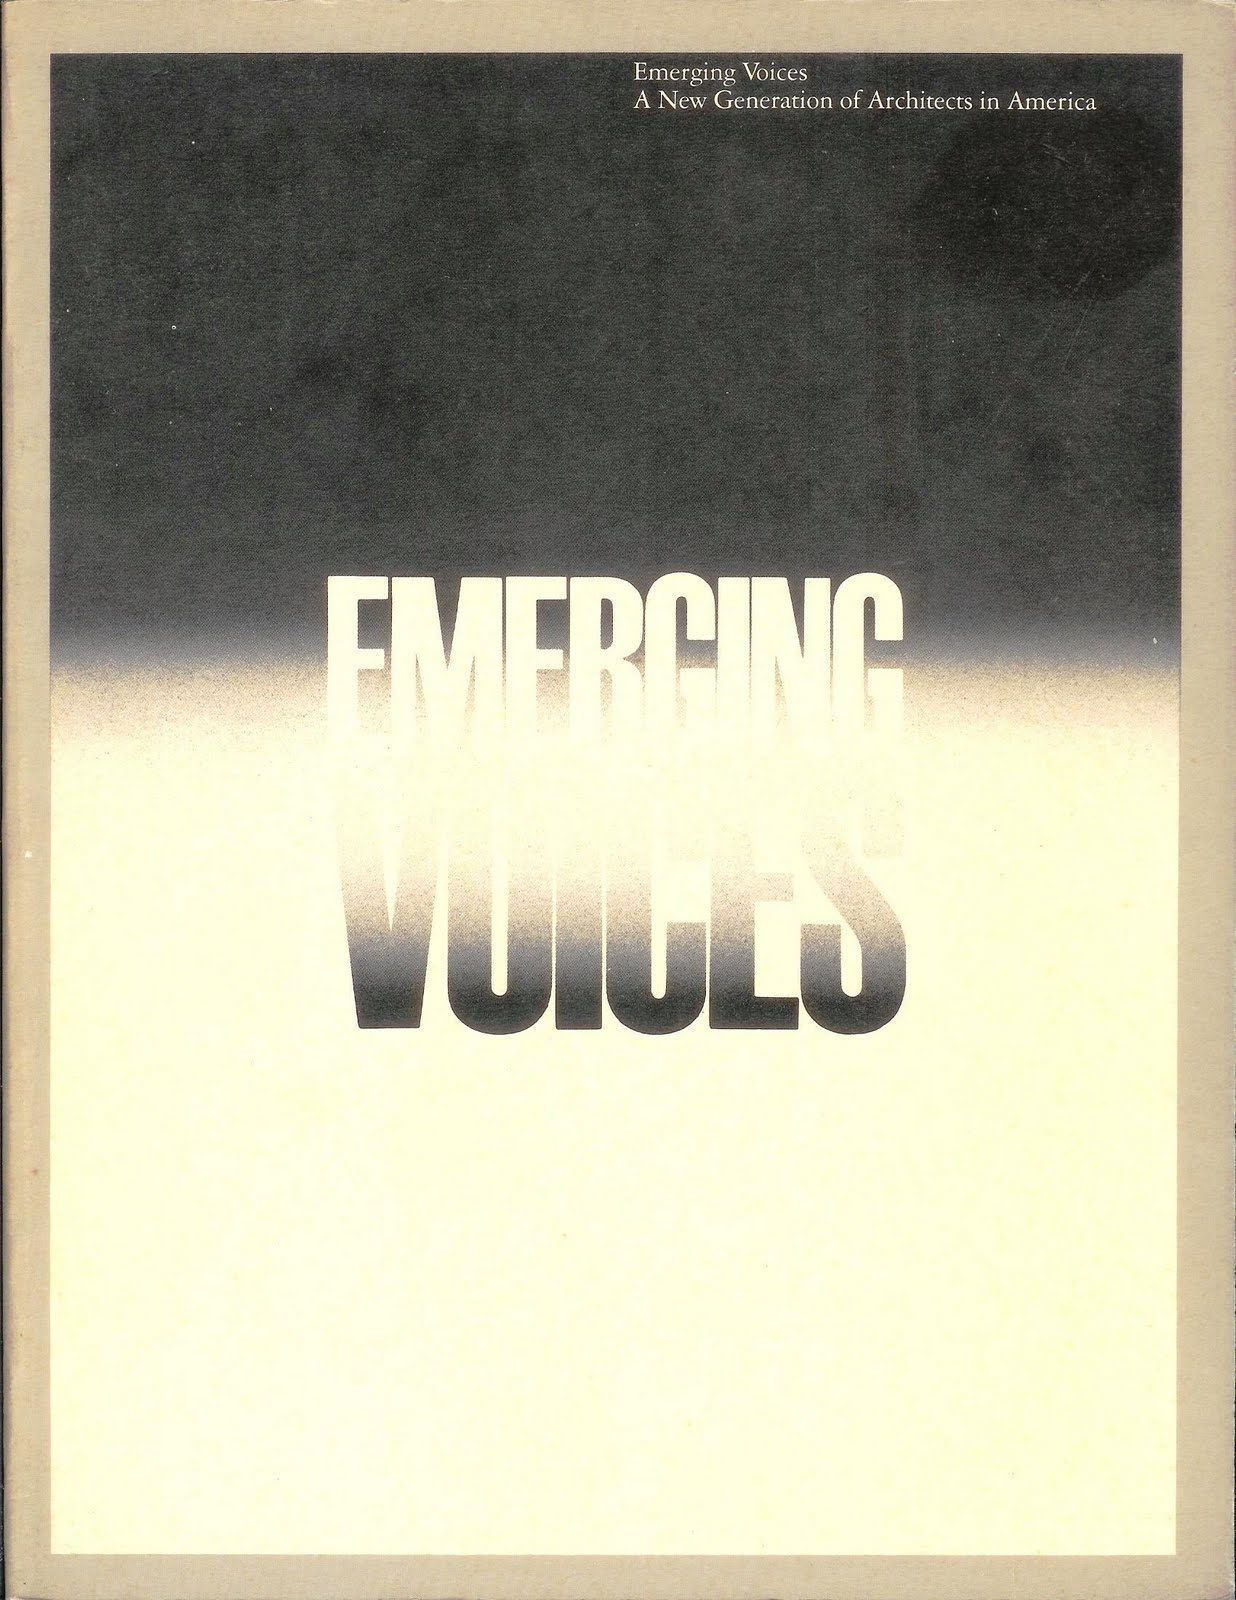 http://2.bp.blogspot.com/_Pmjd5_C6-M4/S84SM7bi2vI/AAAAAAAAAsA/SVs6wy-98fk/s1600/1986,+Emerging+Voices.jpg